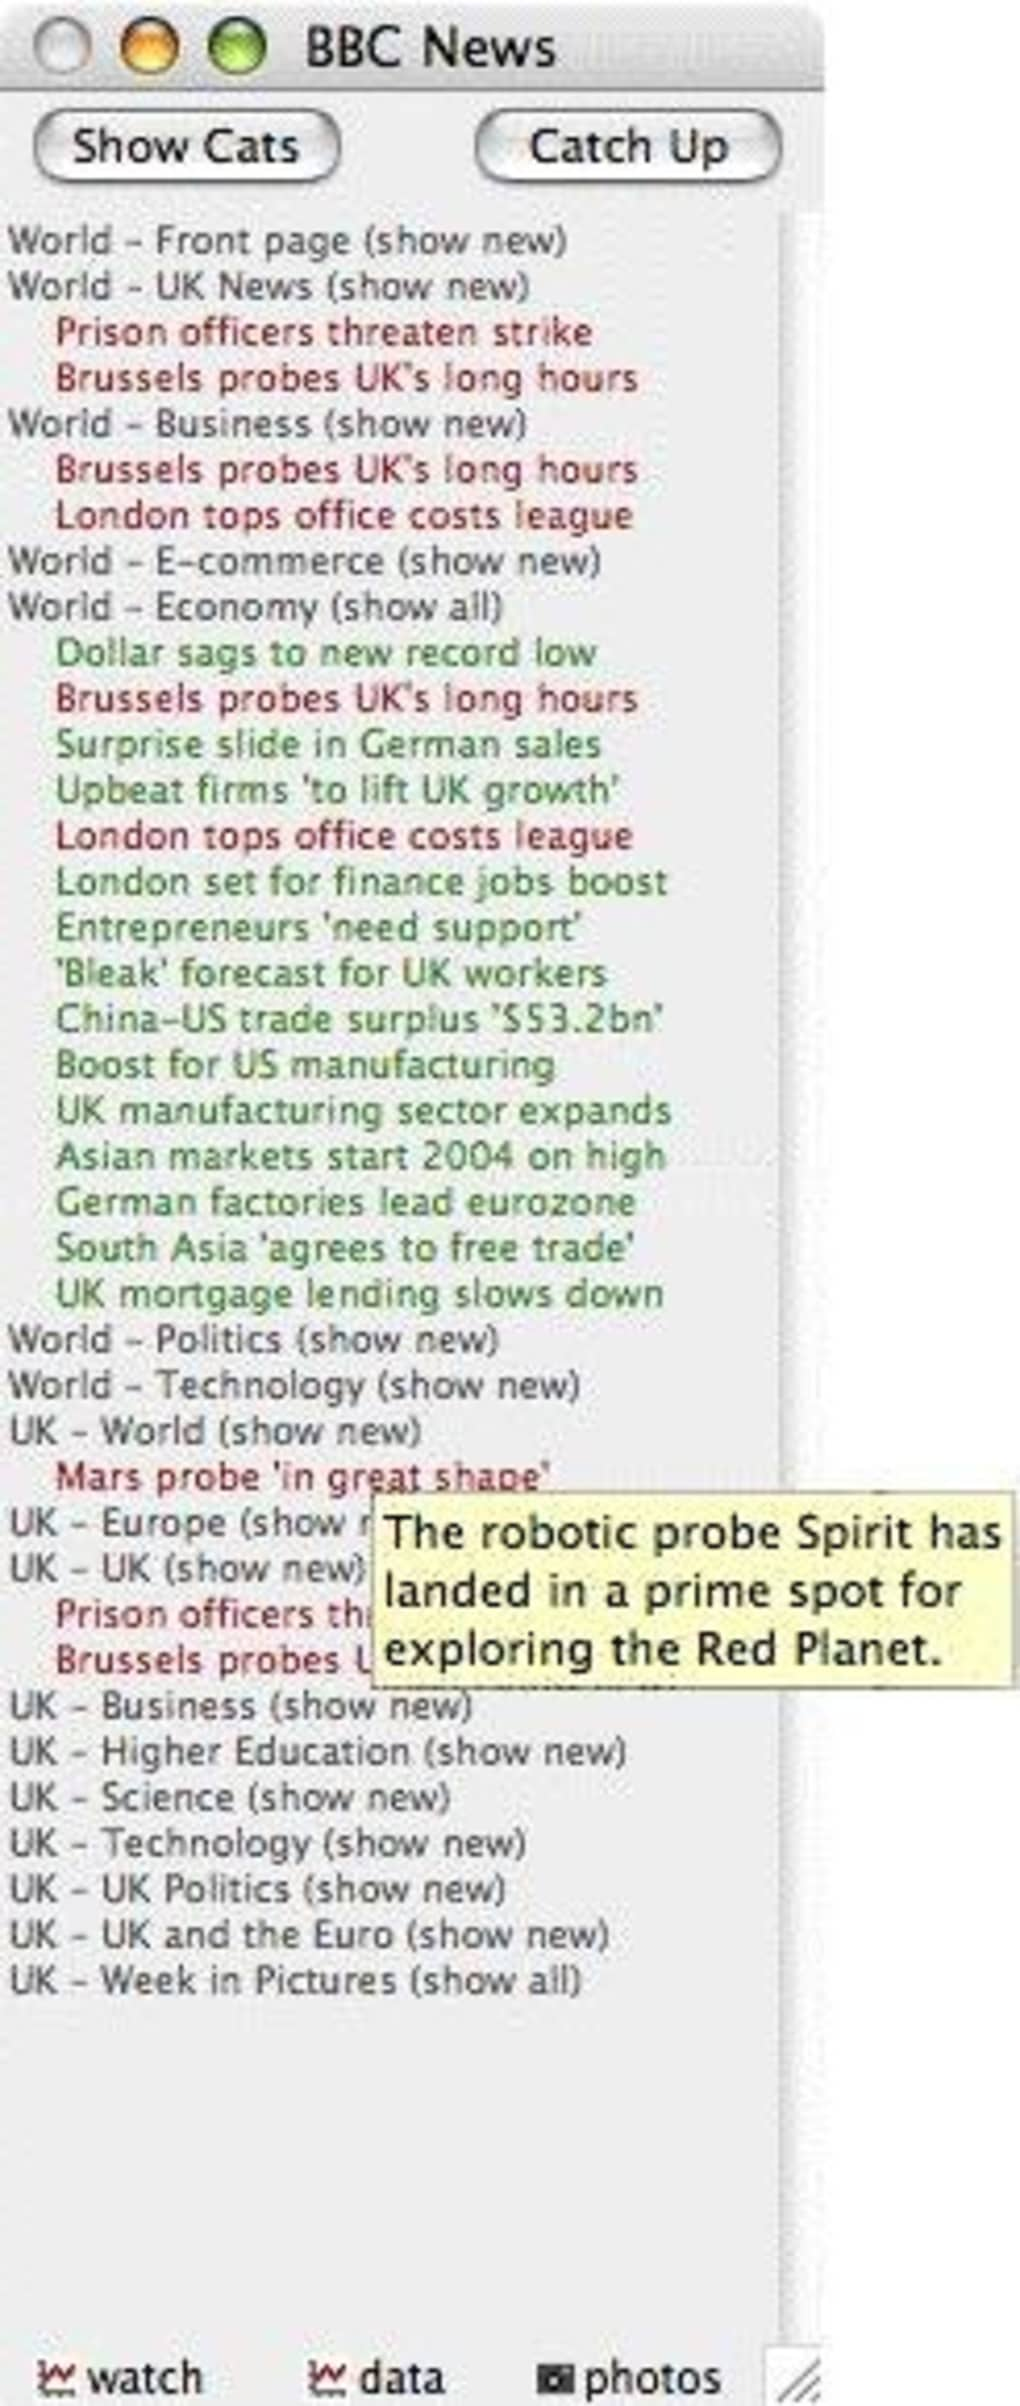 BBC News client